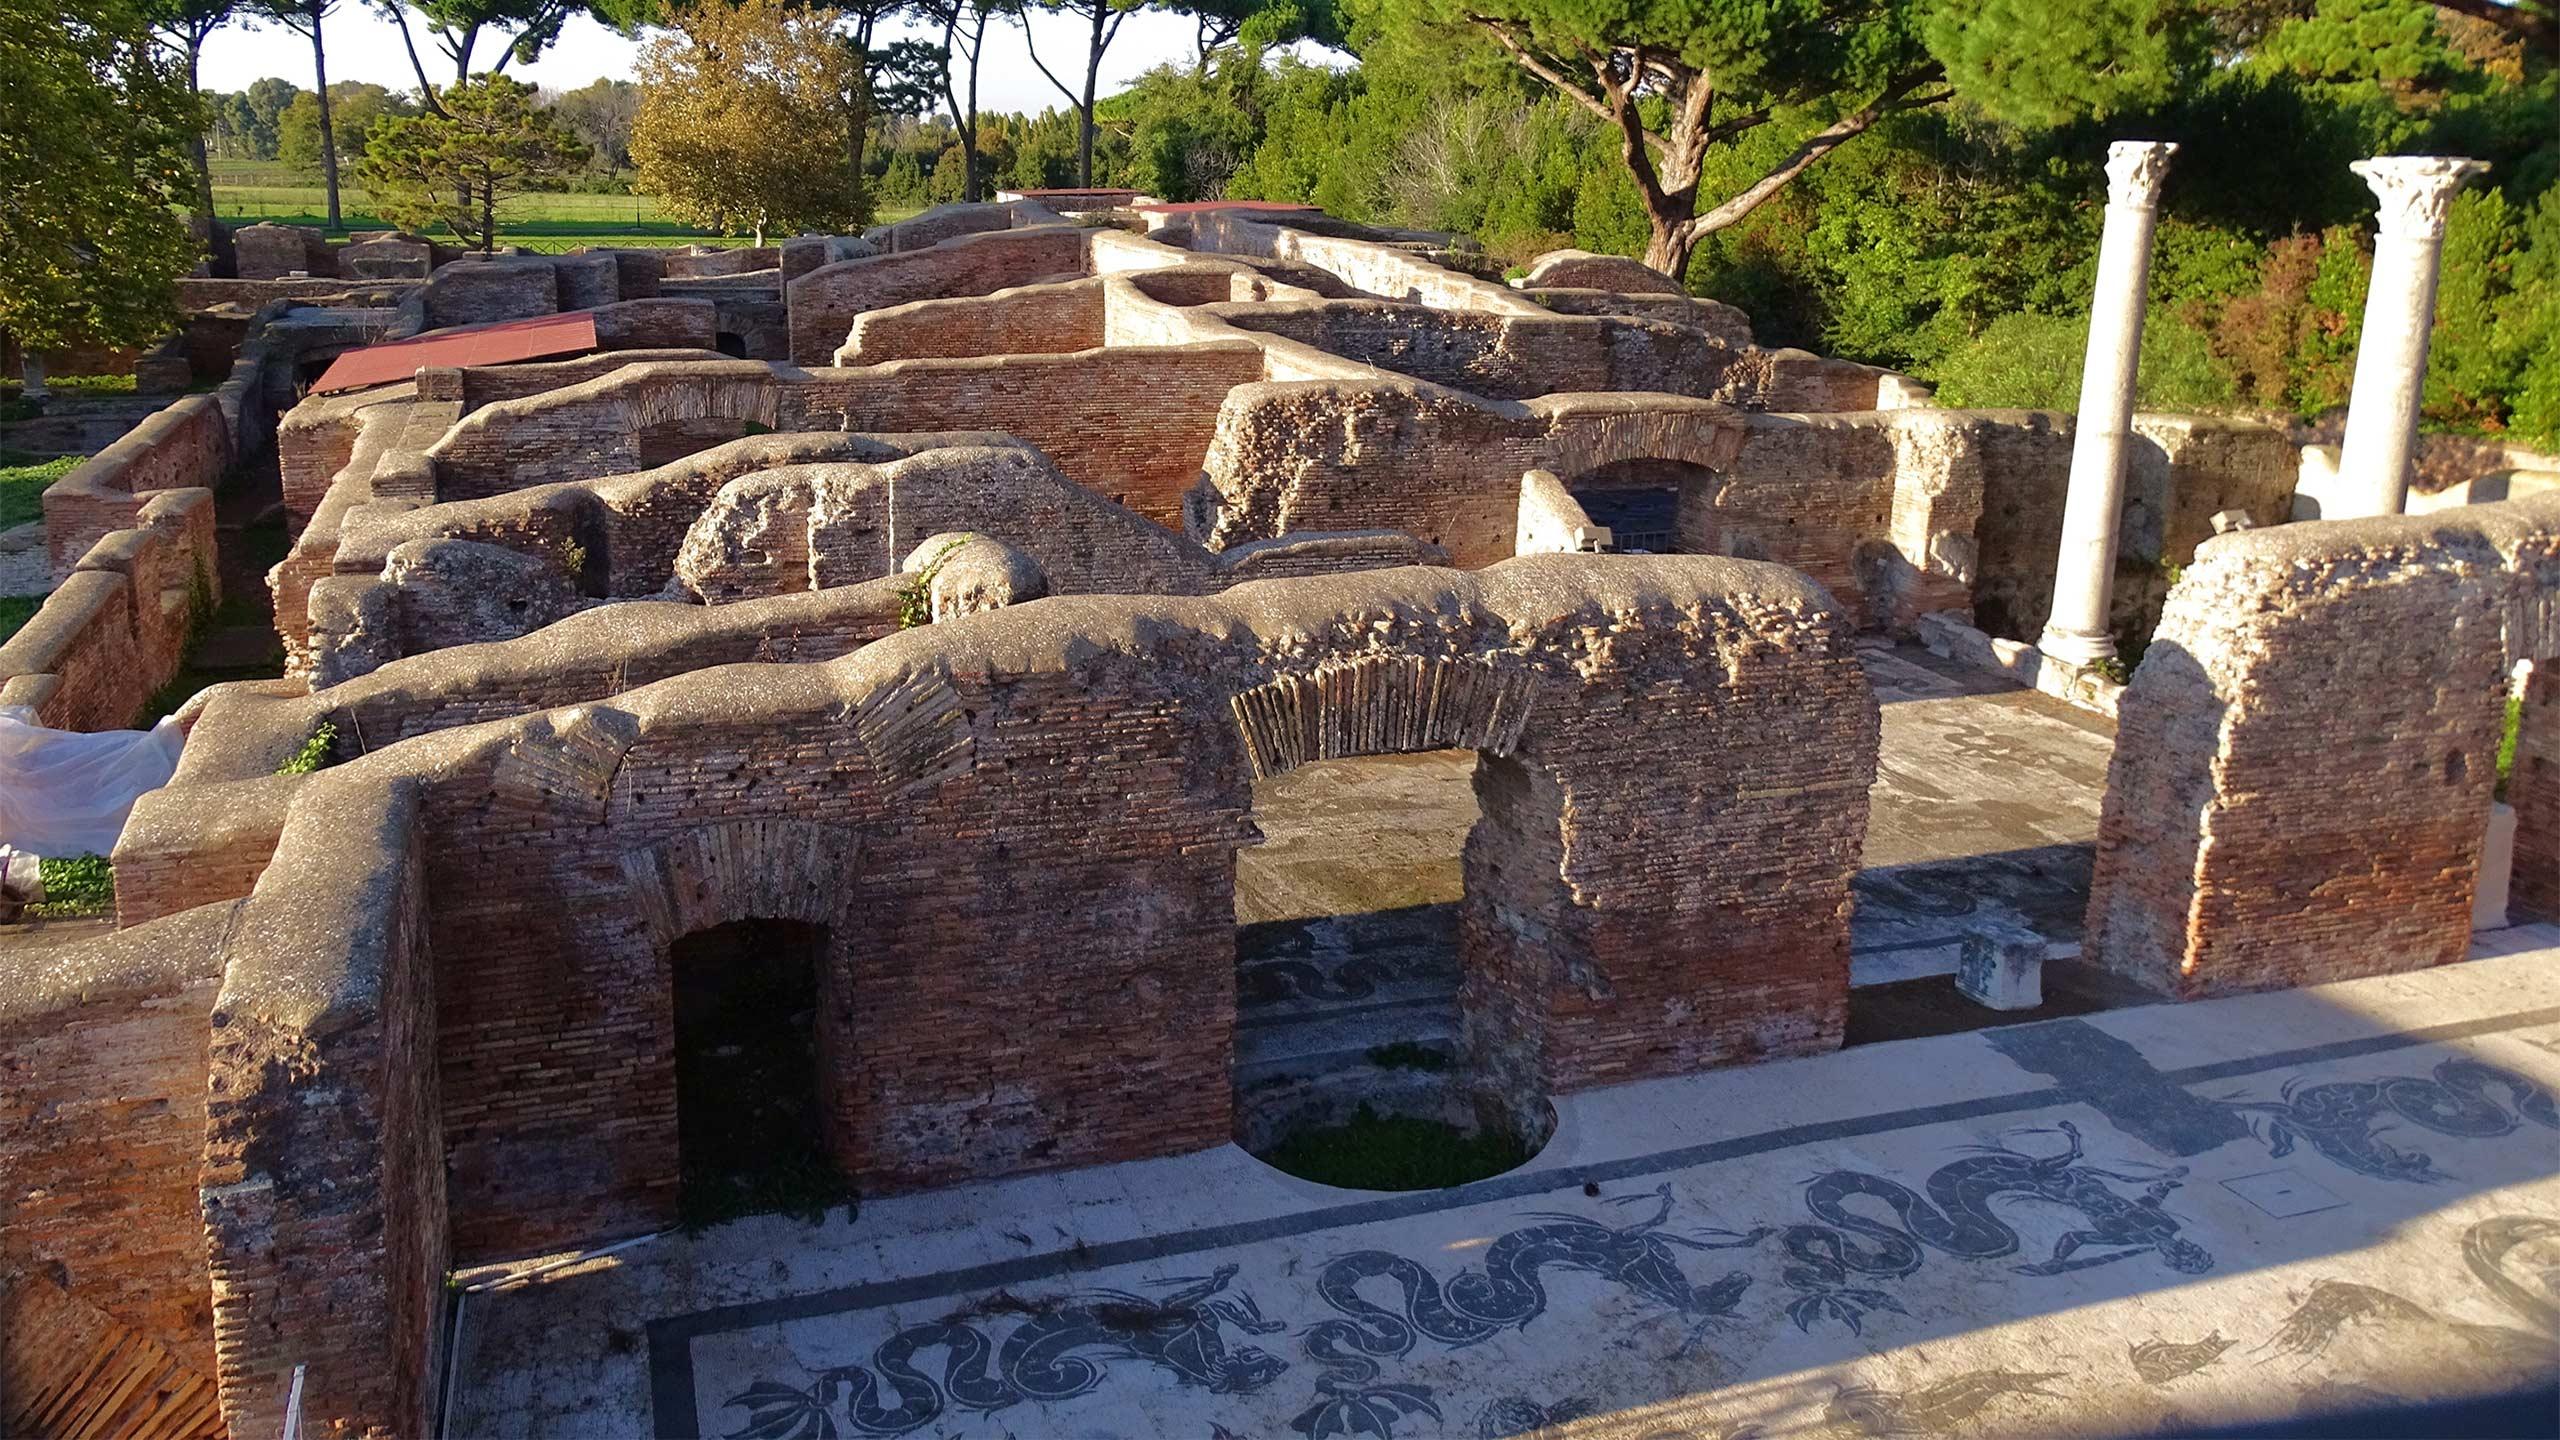 Blog-Quarta-Hospitality-in-Rome-Hotel-Oxford-Rome